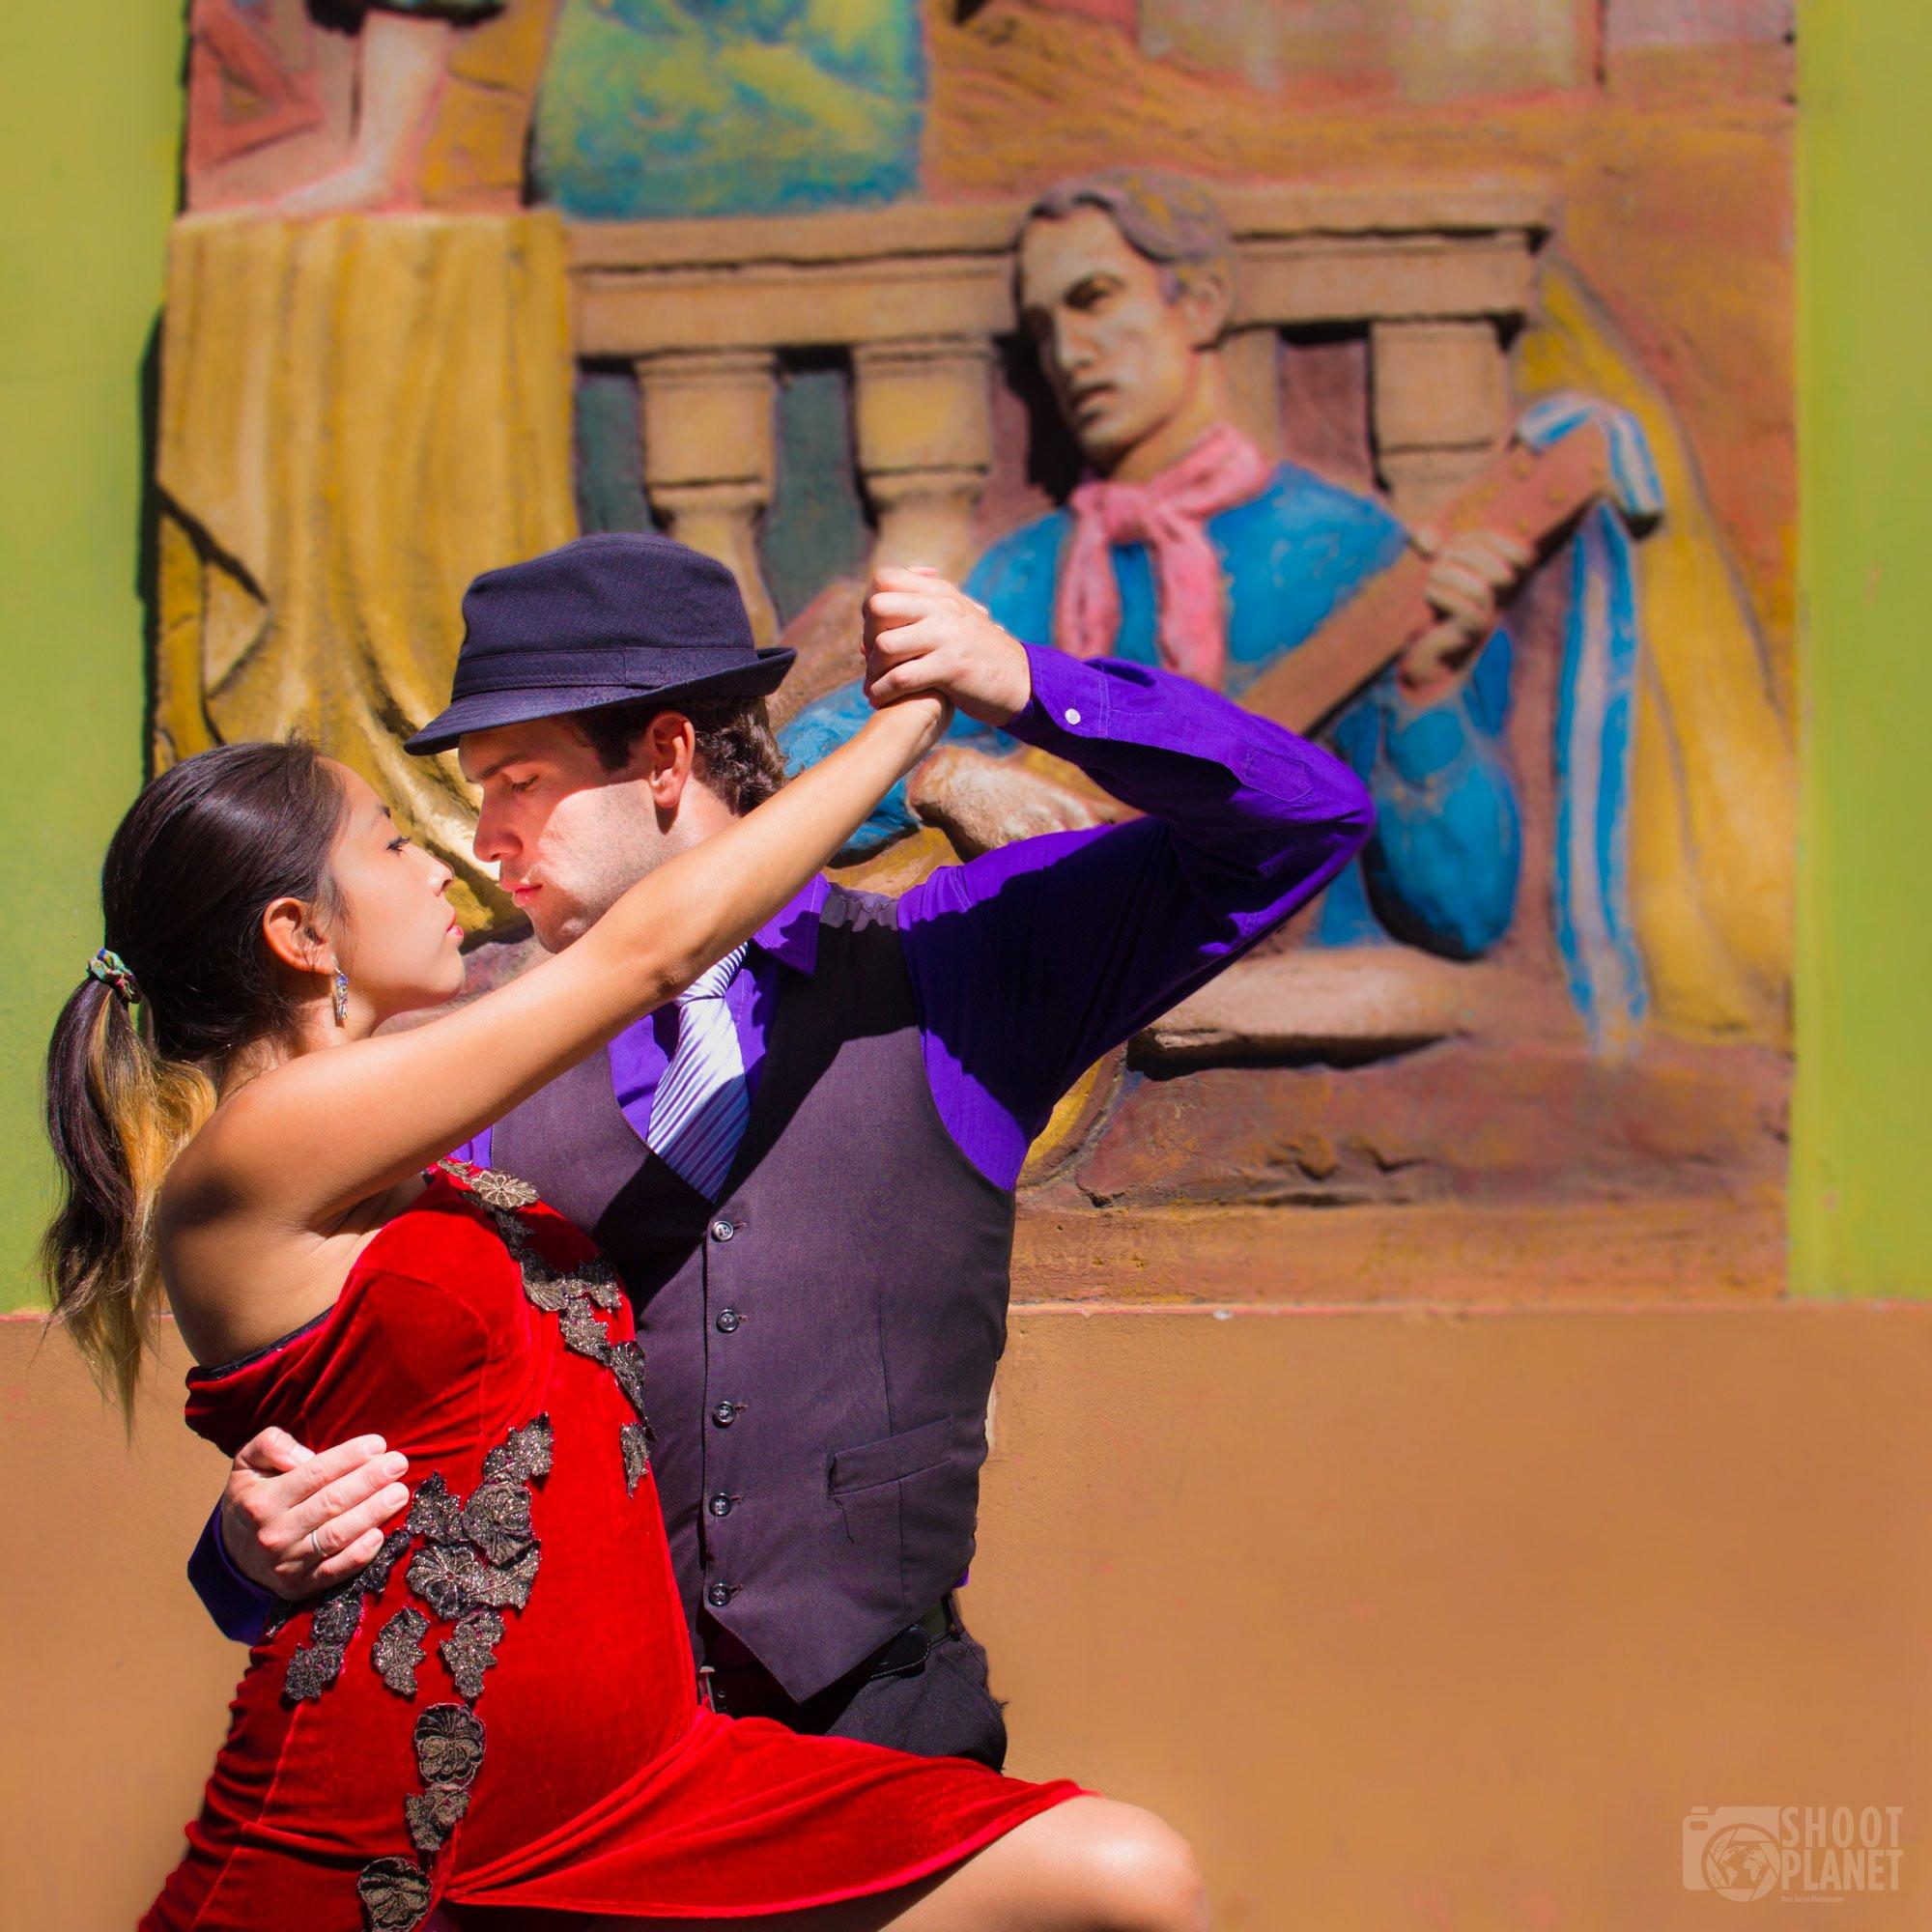 Tango dancers in Buenos Aires Argentina